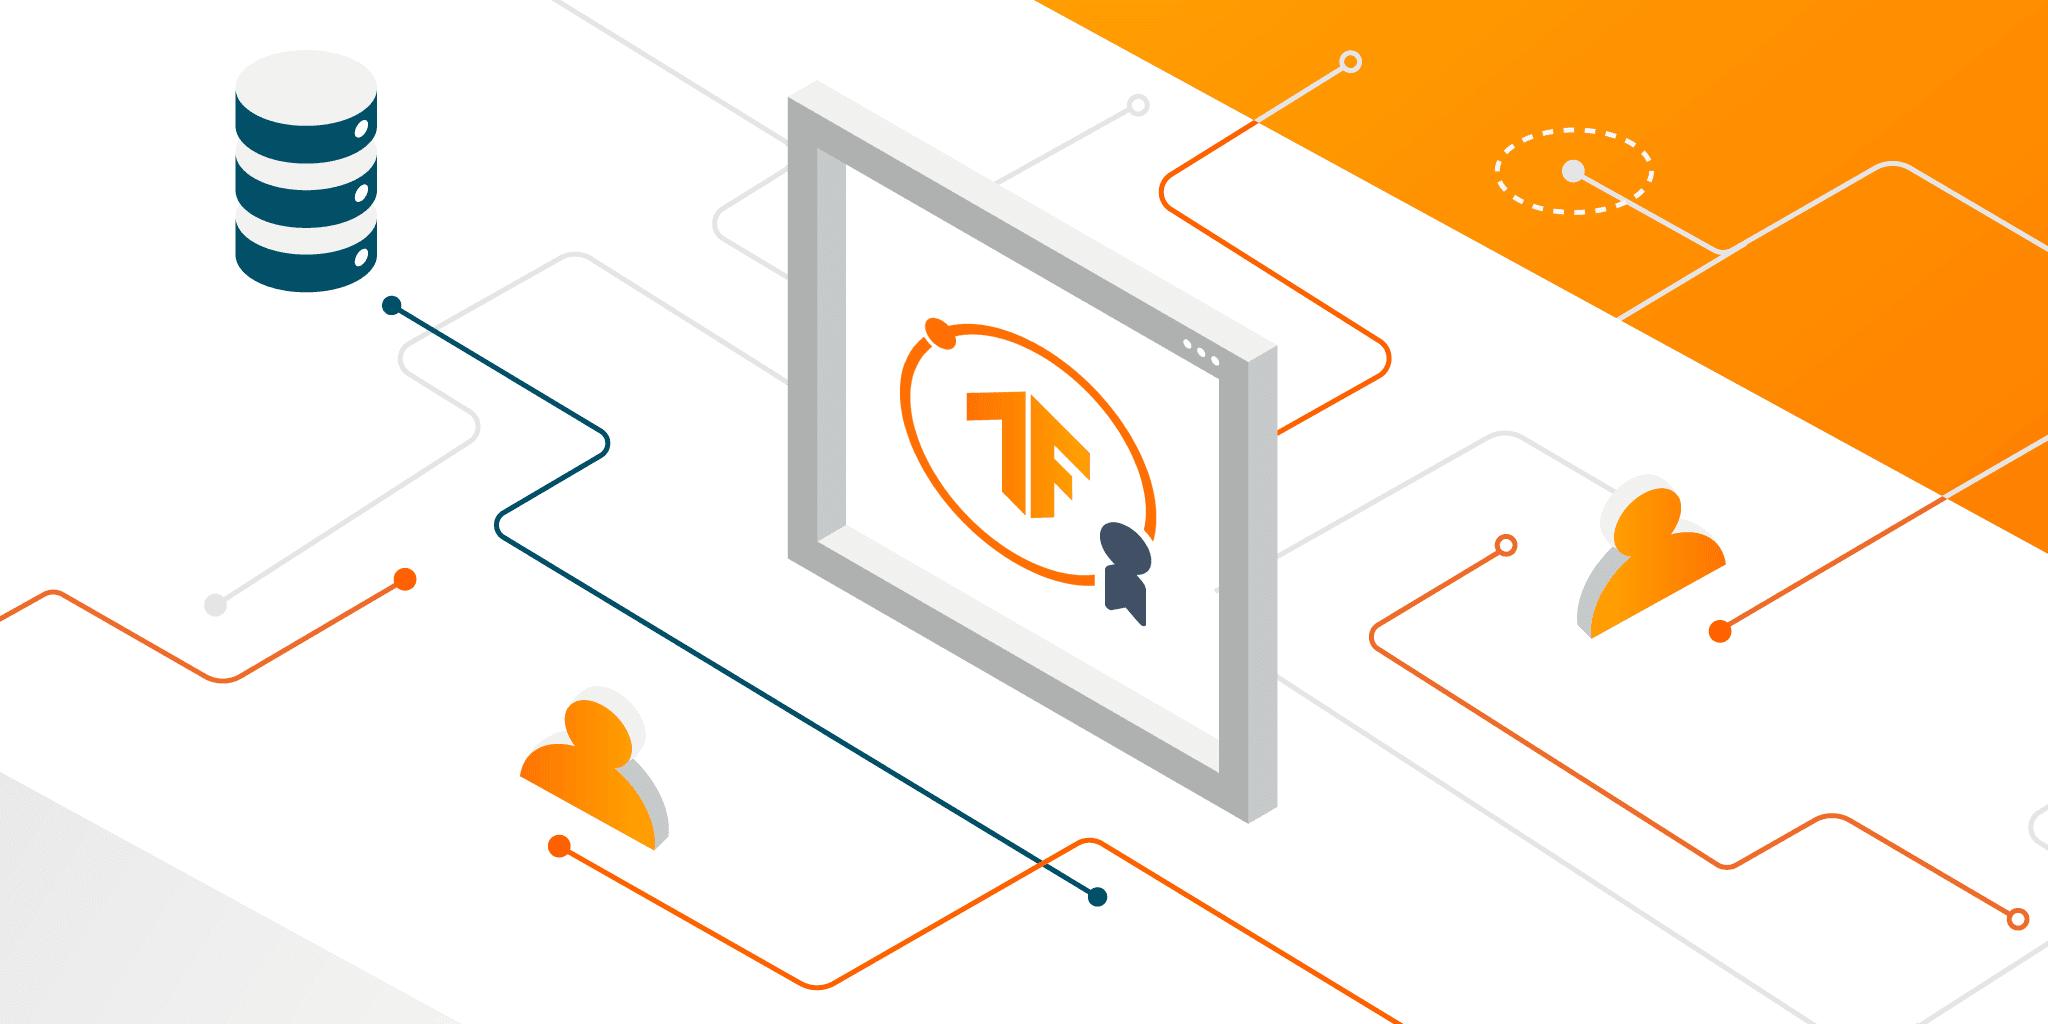 The TensorFlow Developer Certificate turns 1!